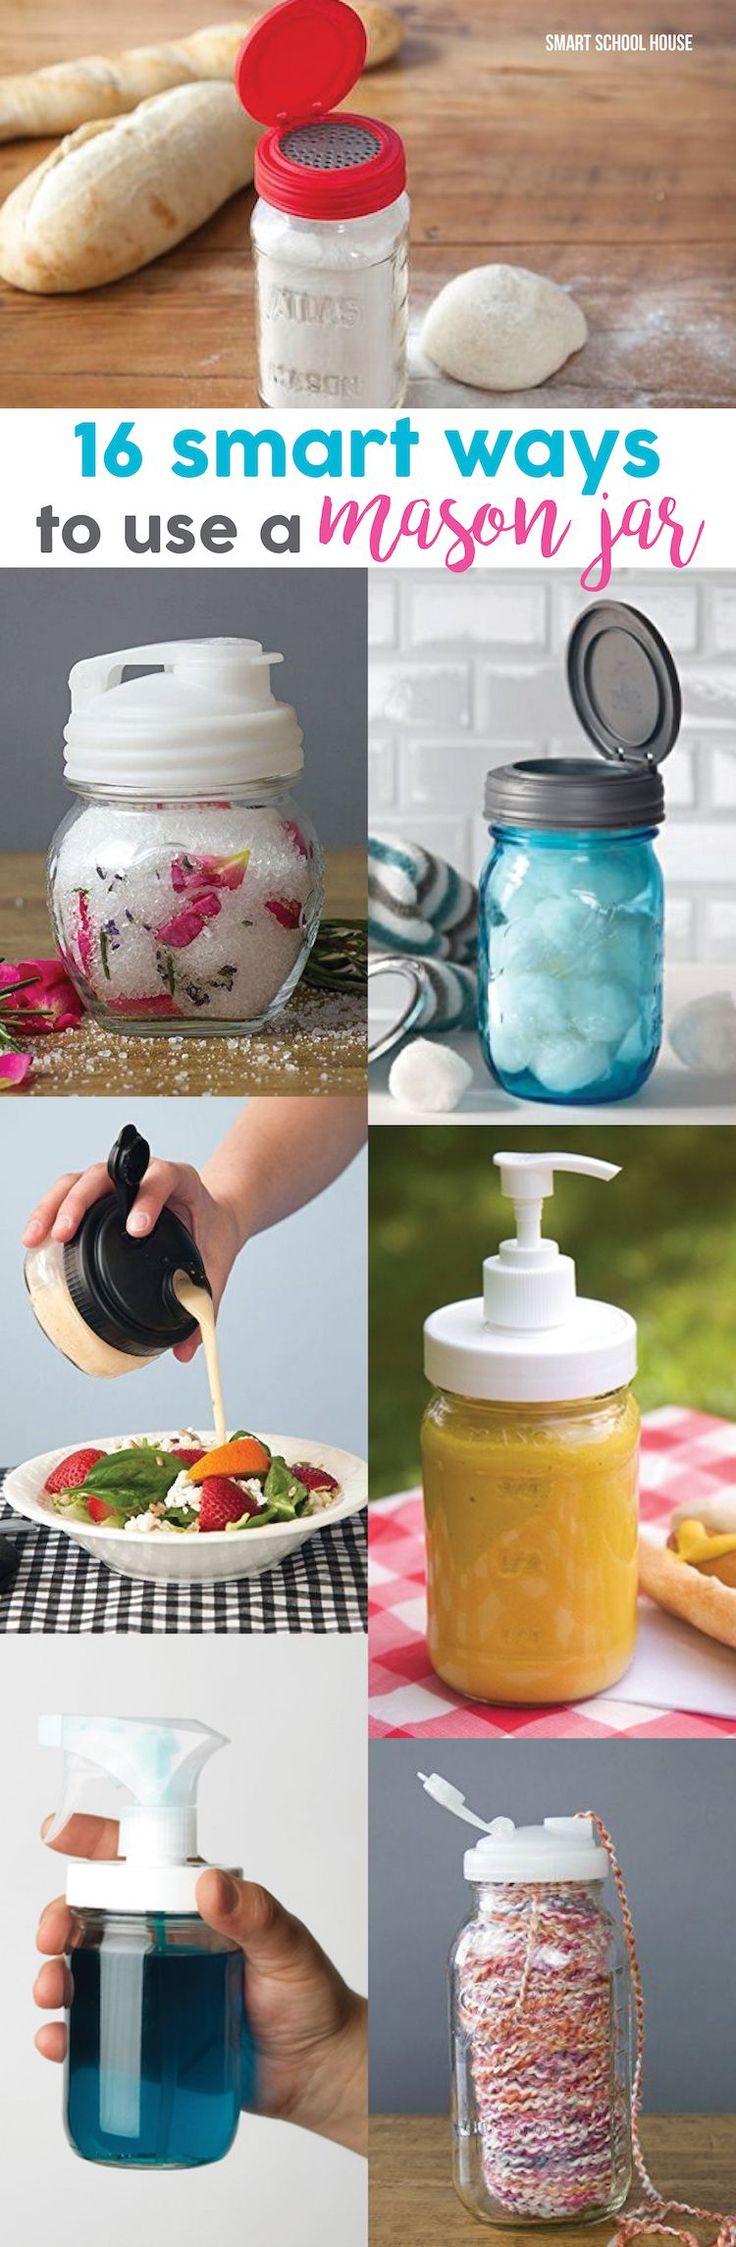 best mason jar images on pinterest mason jars bricolage and